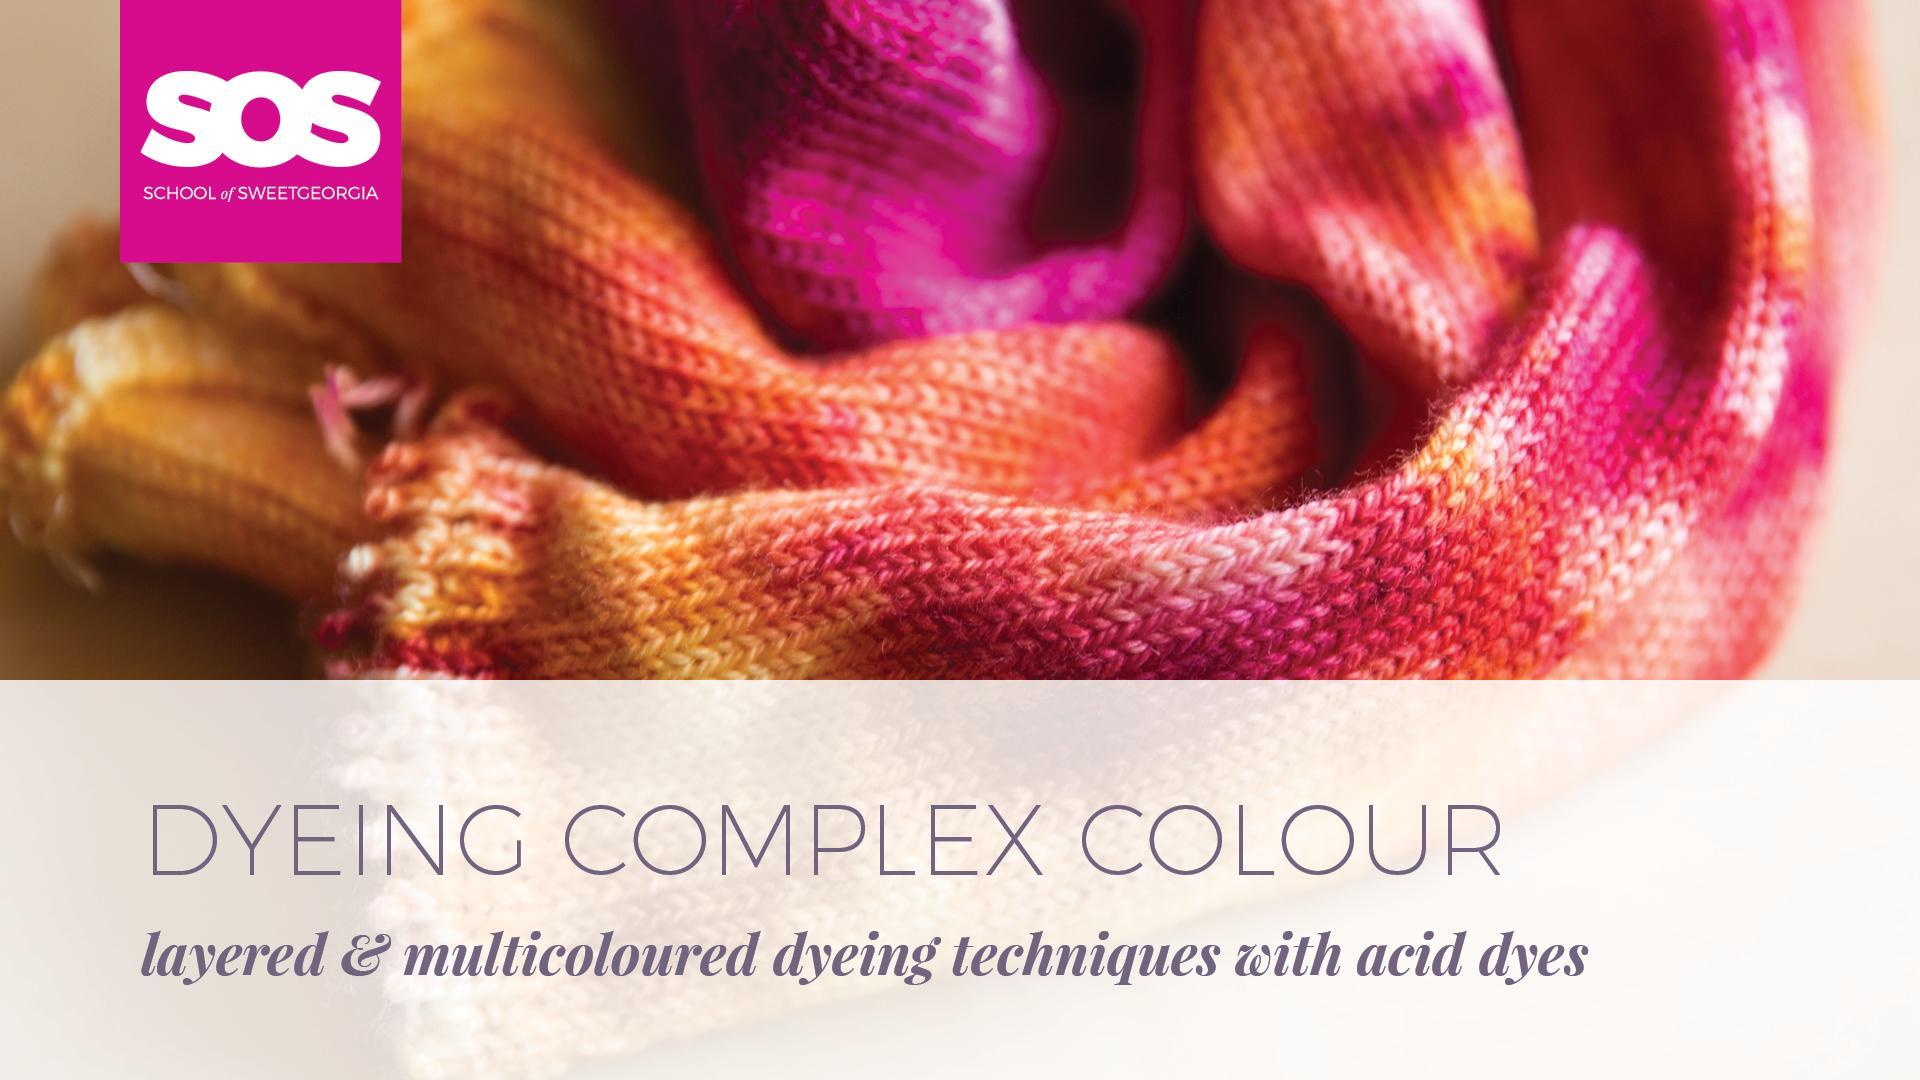 Dyeing Complex Colour | School of SweetGeorgia